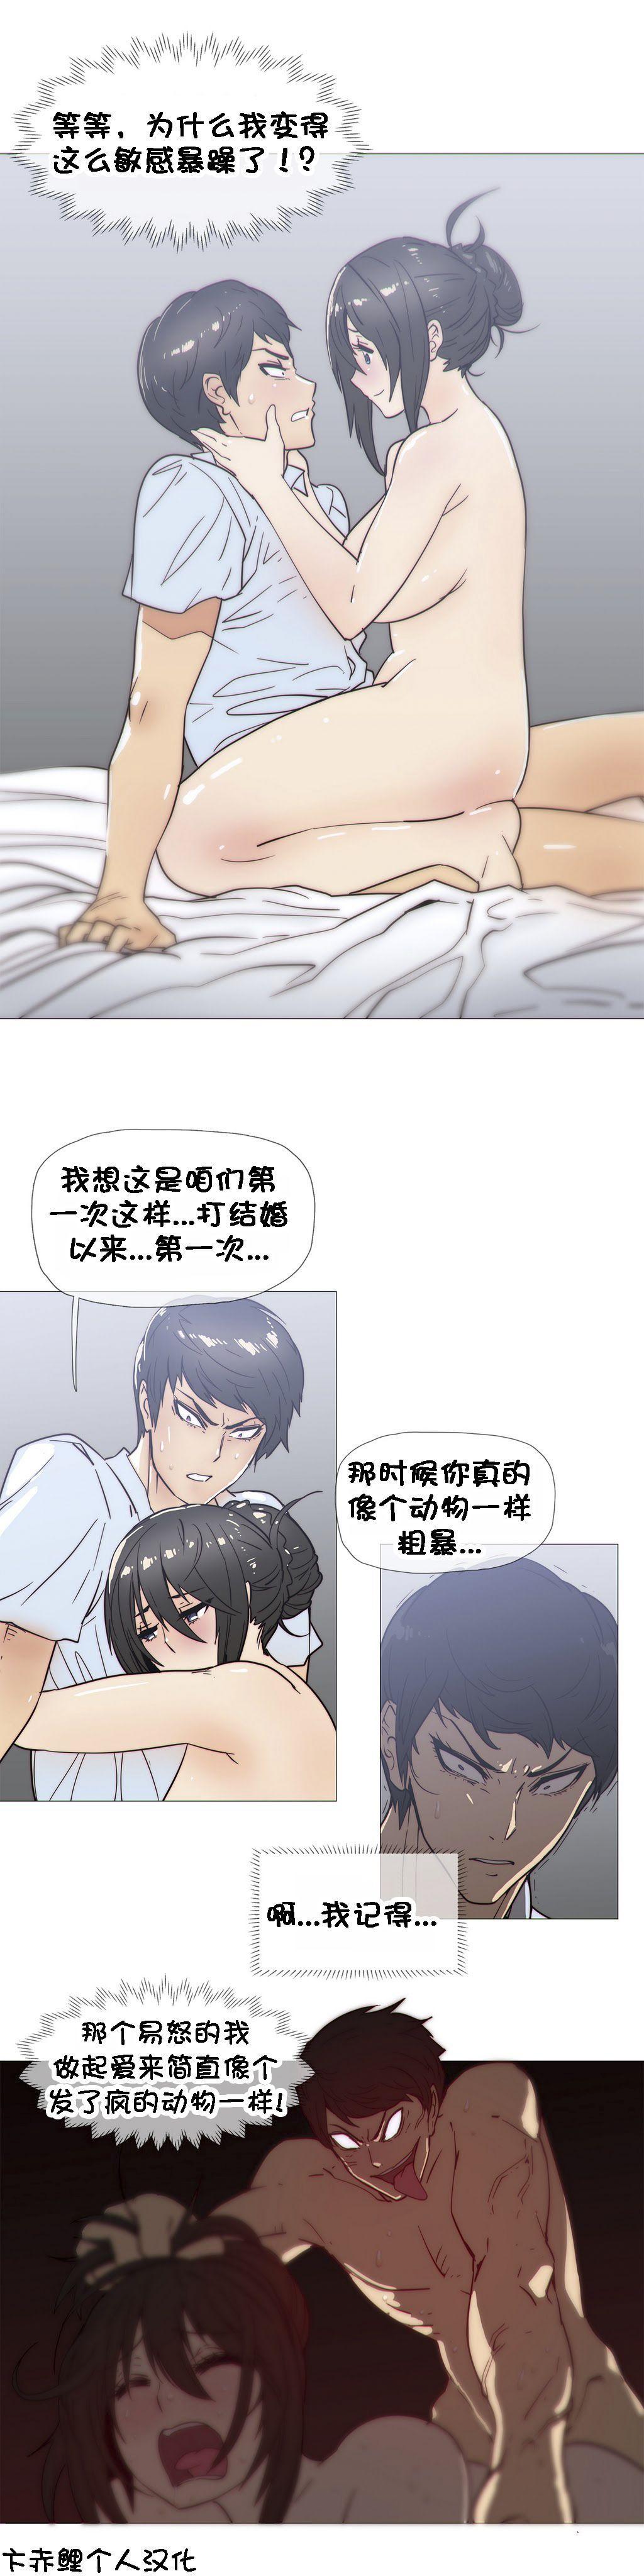 HouseHold Affairs 【卞赤鲤个人汉化】1~33话(持续更新中) 550